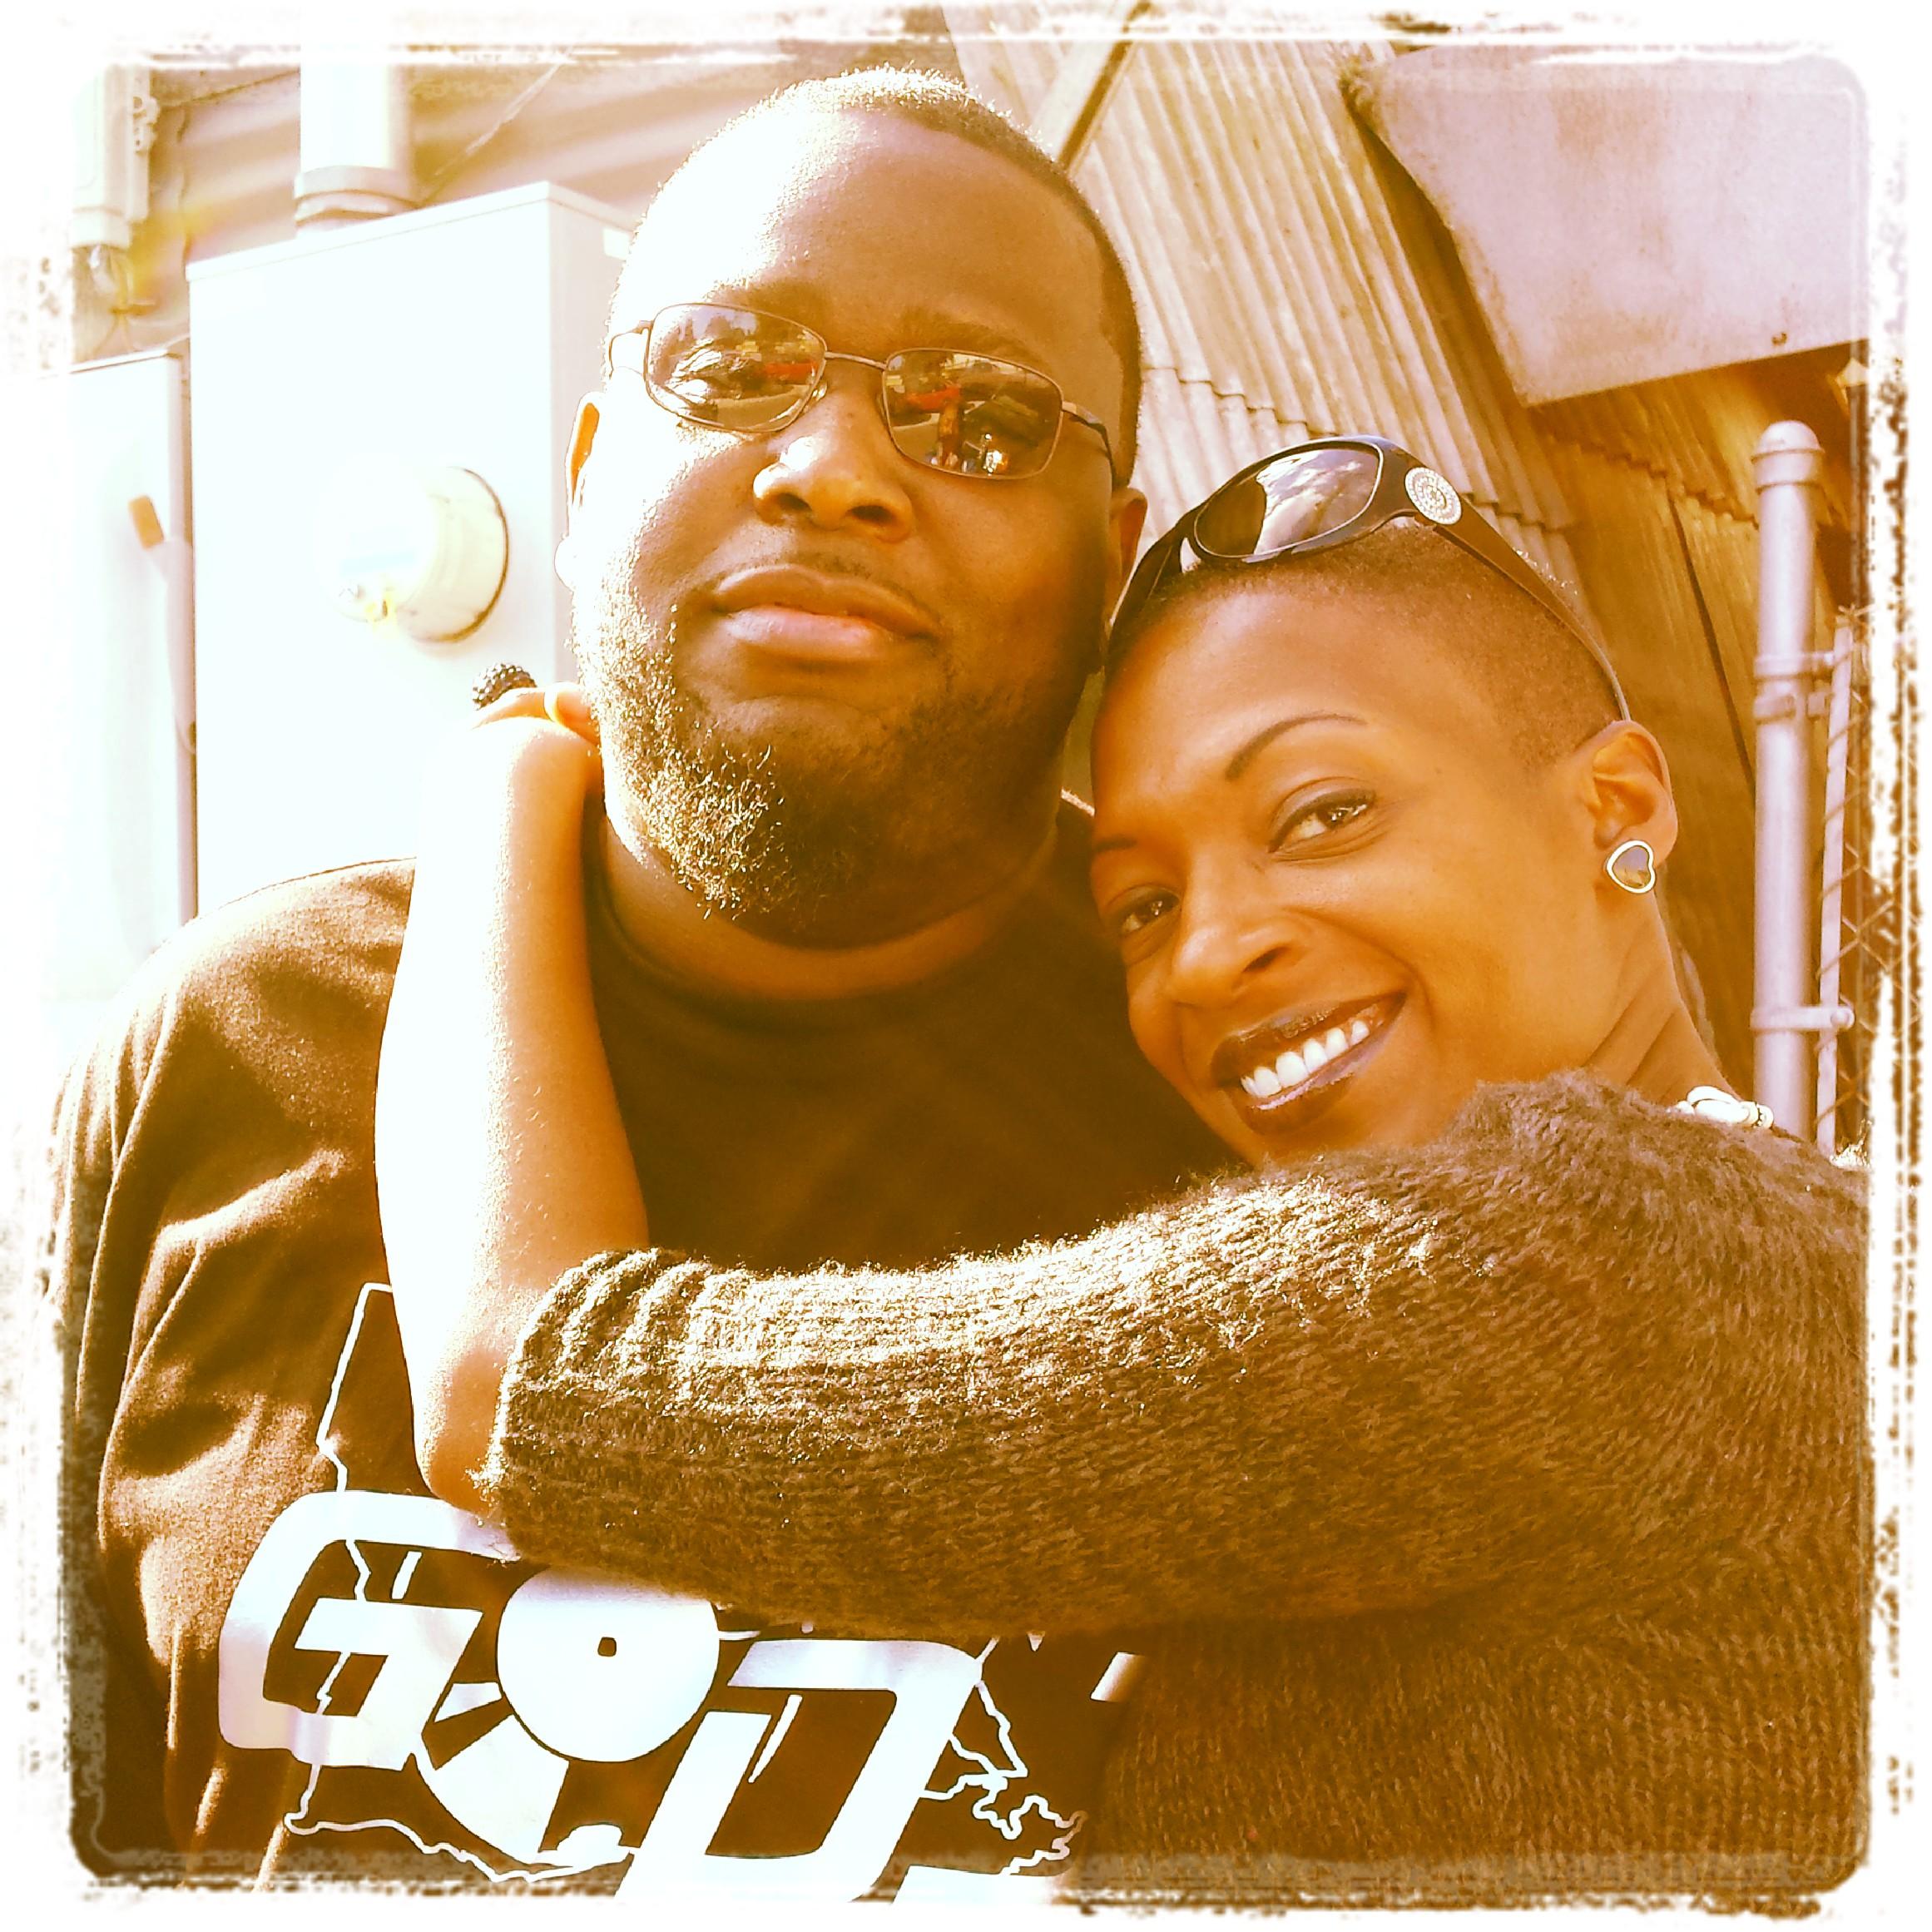 Go DJ Black N Mild (left) & Me==> @fantasy_5 (right)